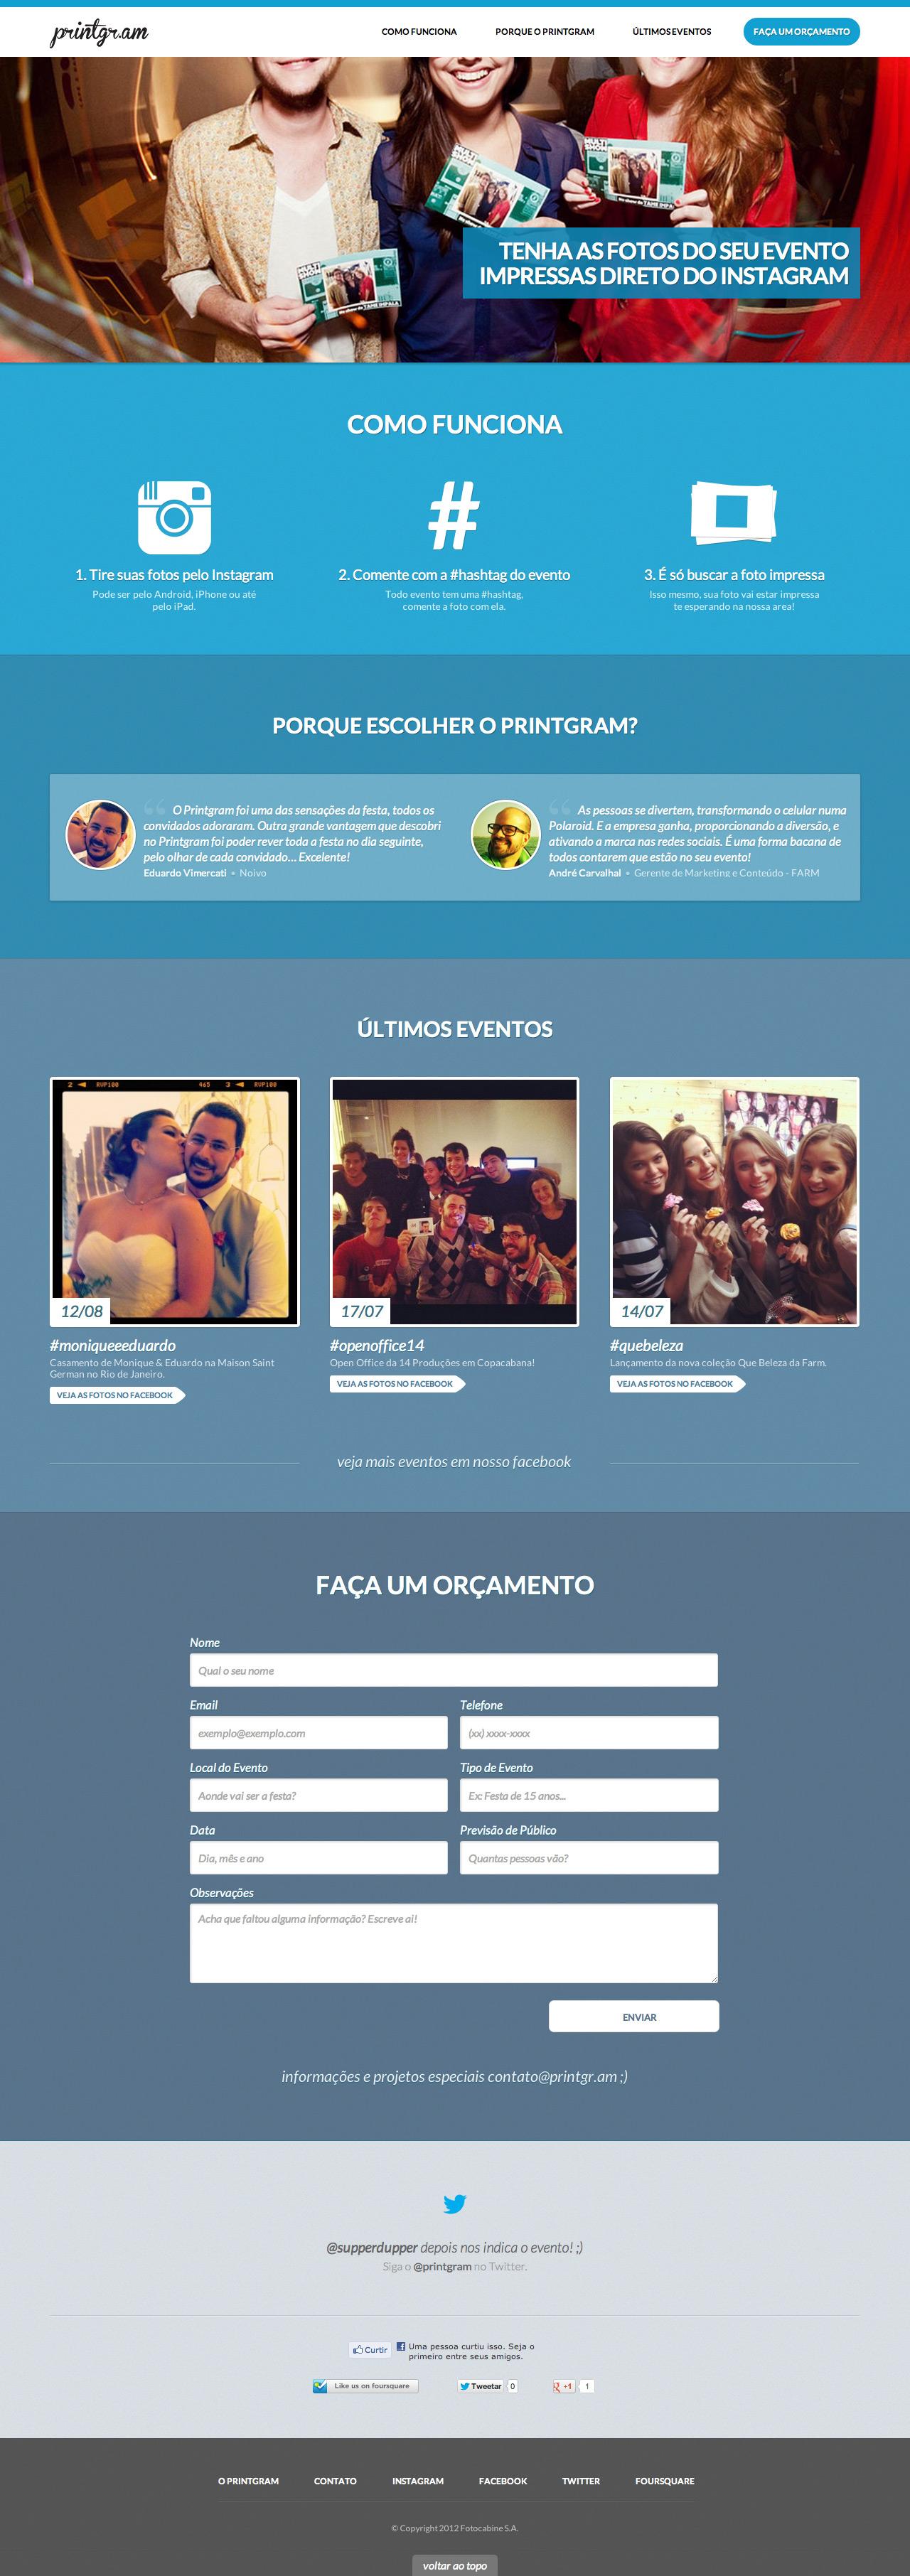 Printgram Website Screenshot